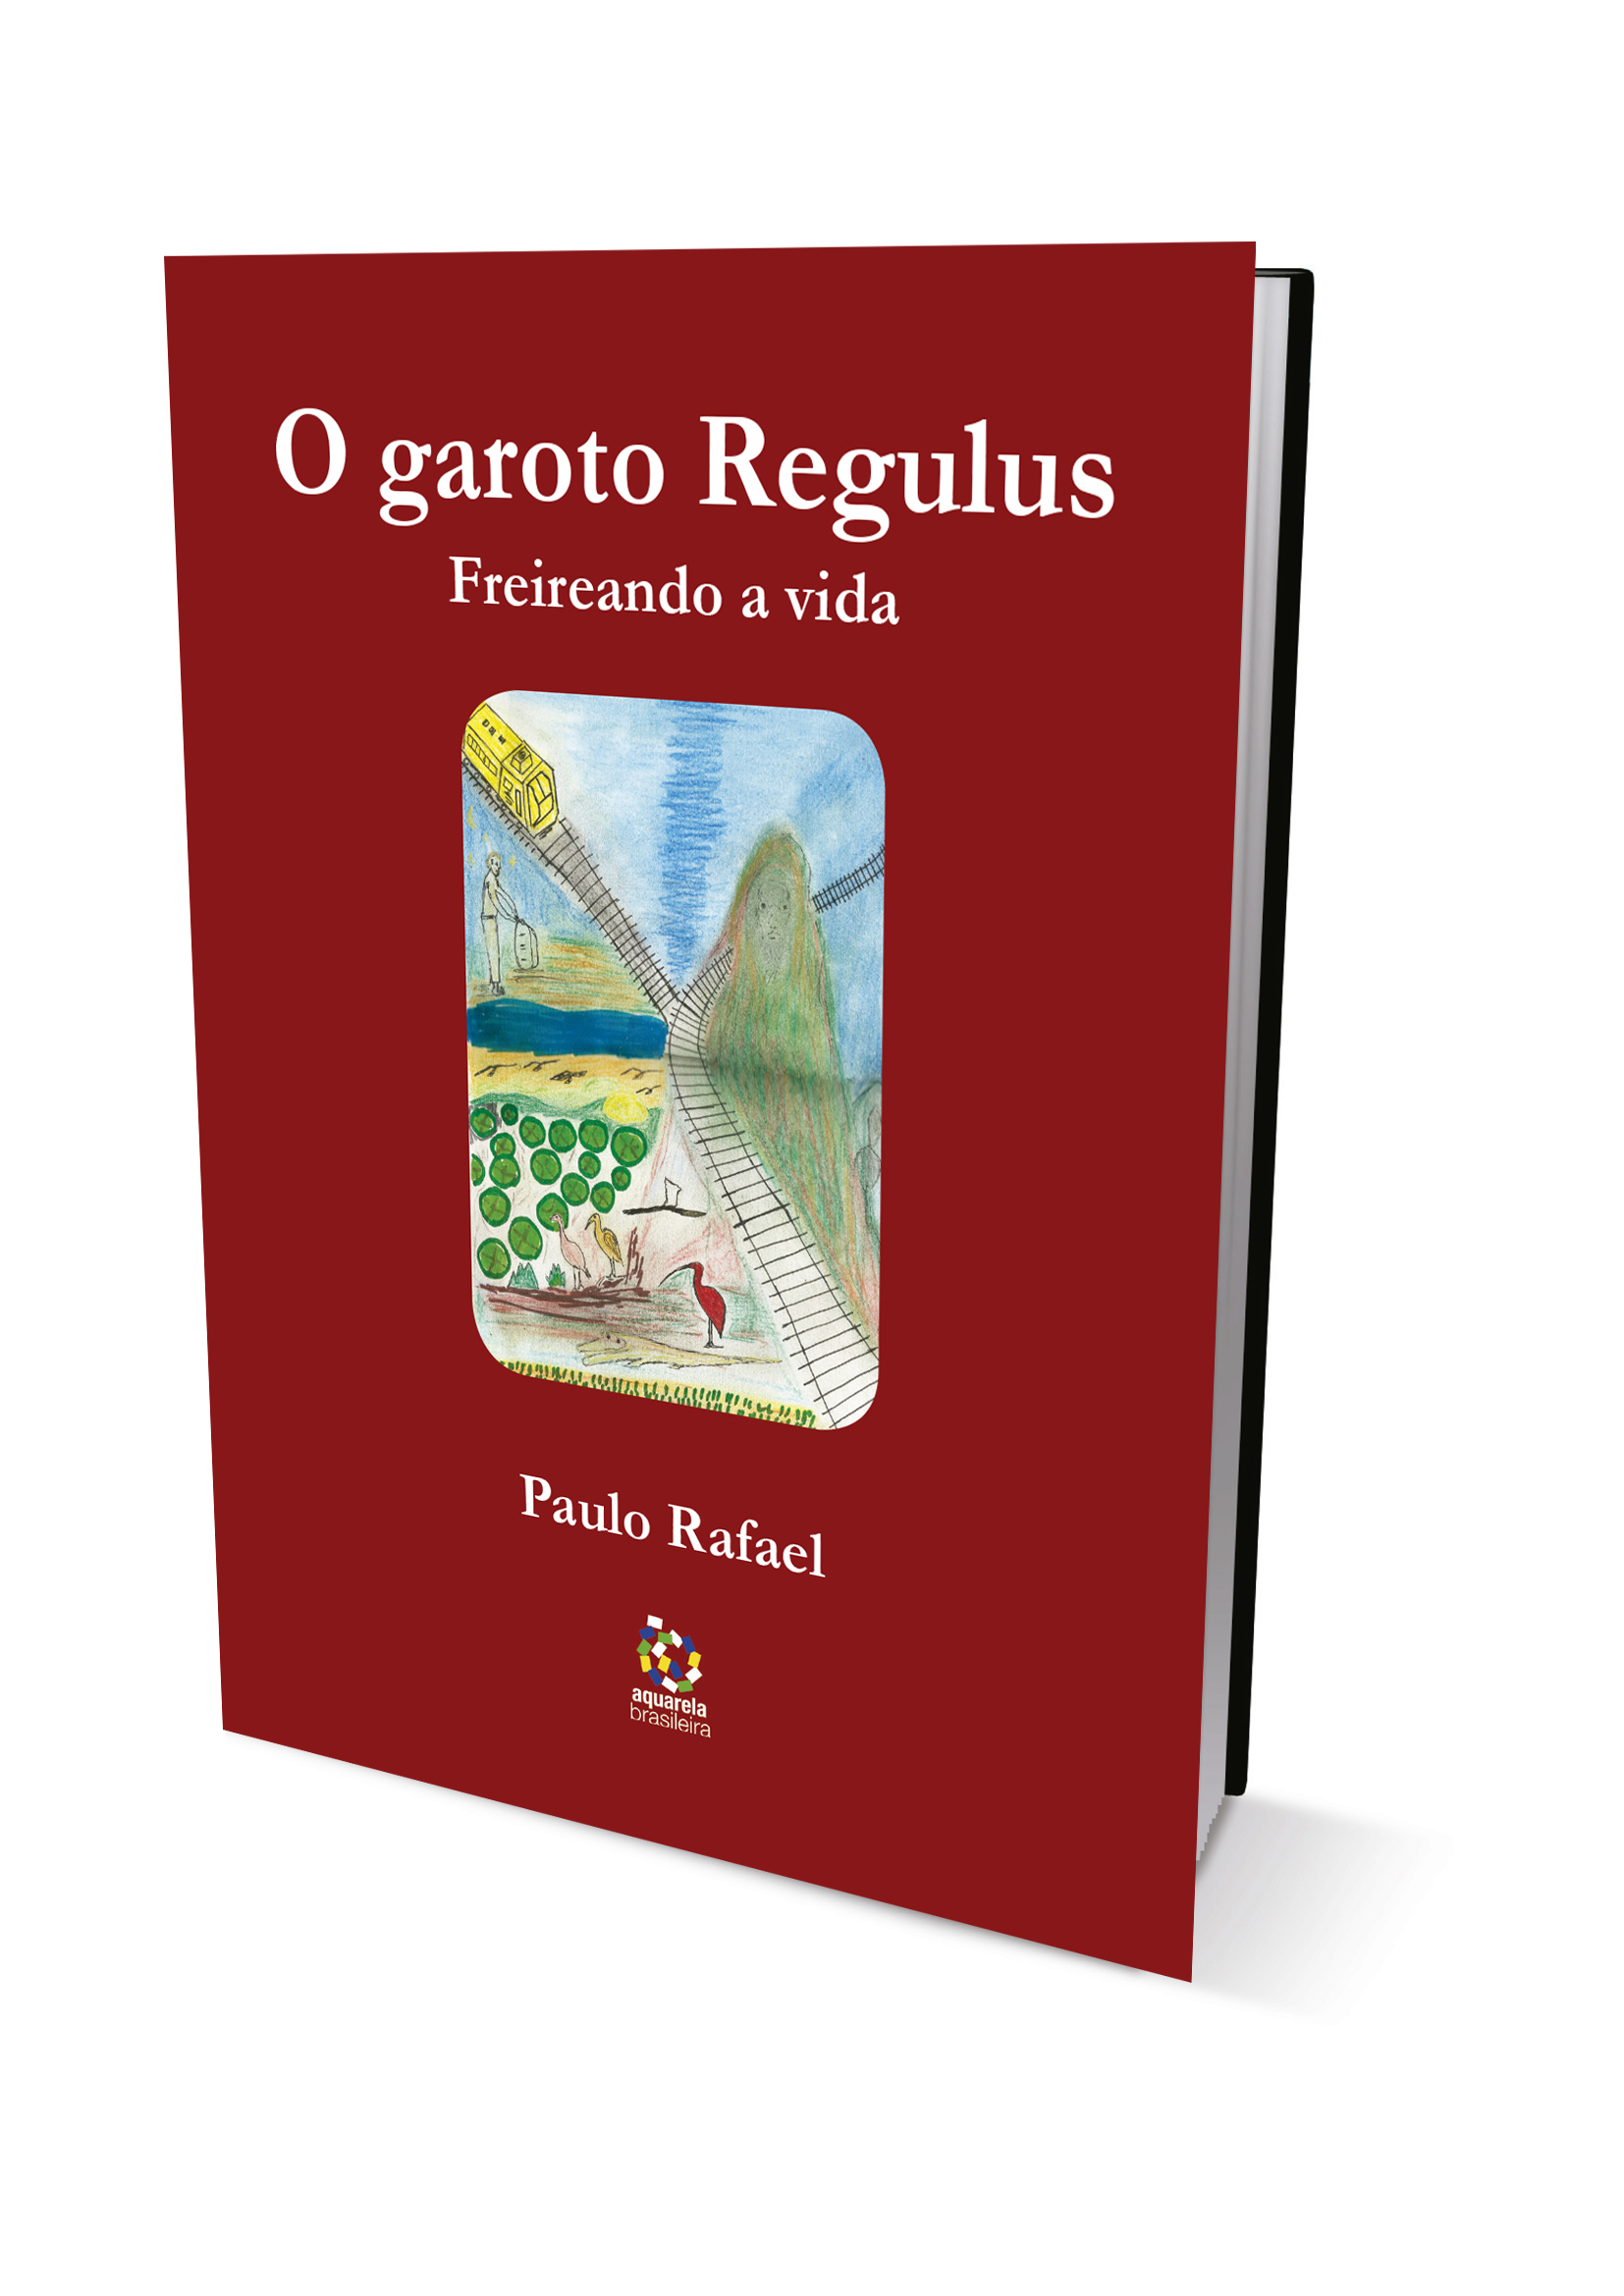 capa_O garoto regulus_3d_final